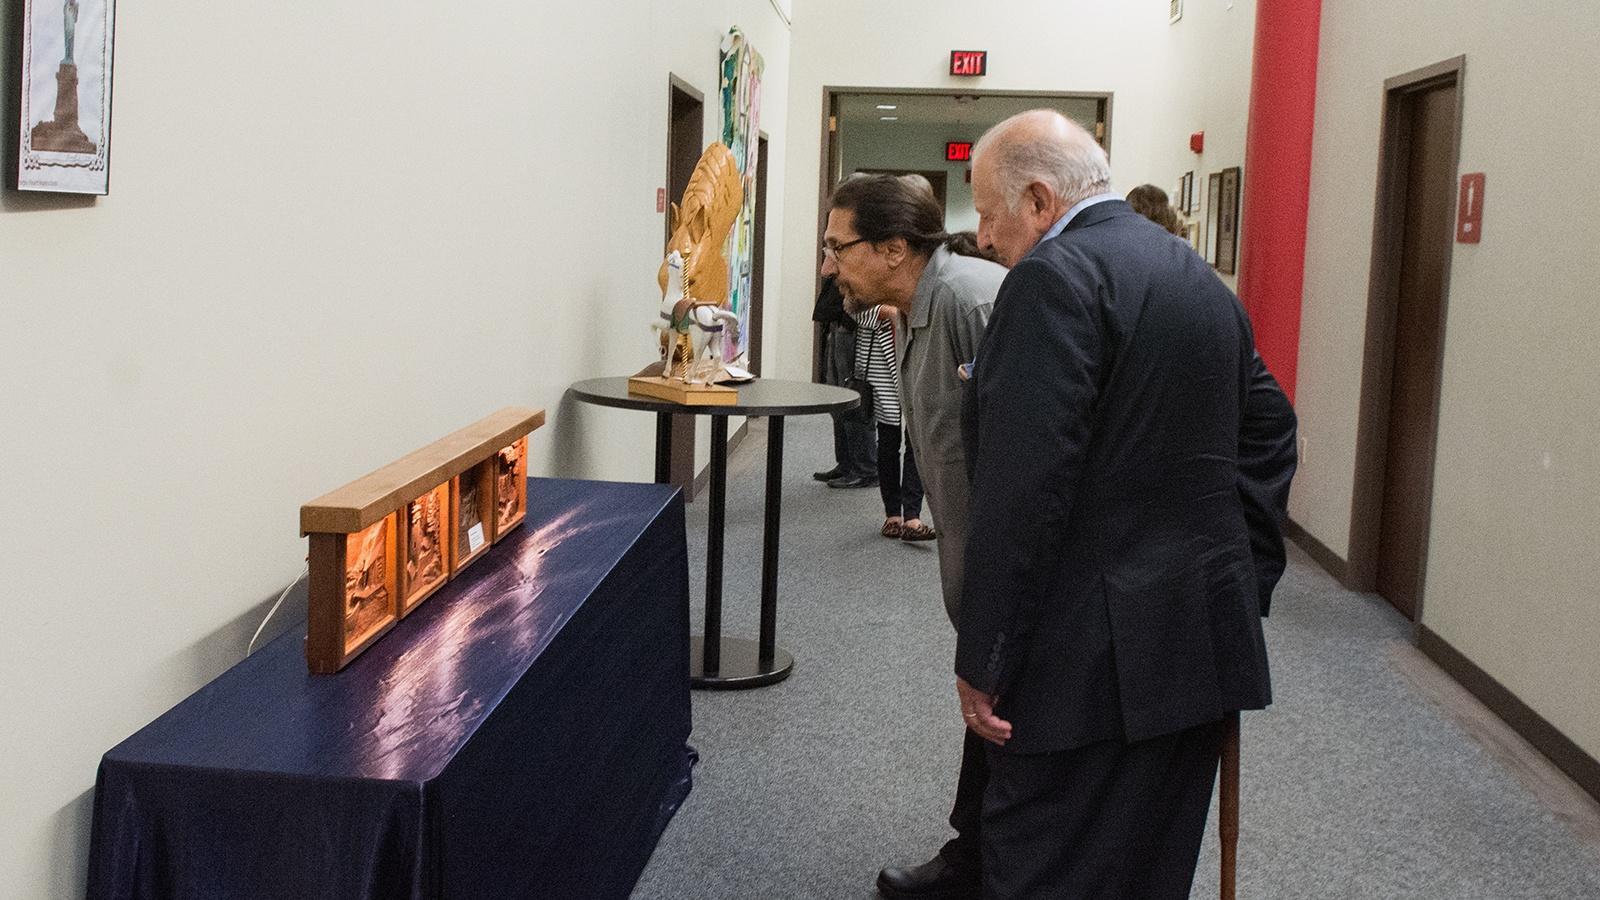 Visitors viewing artwork on display at Horizons Gallery